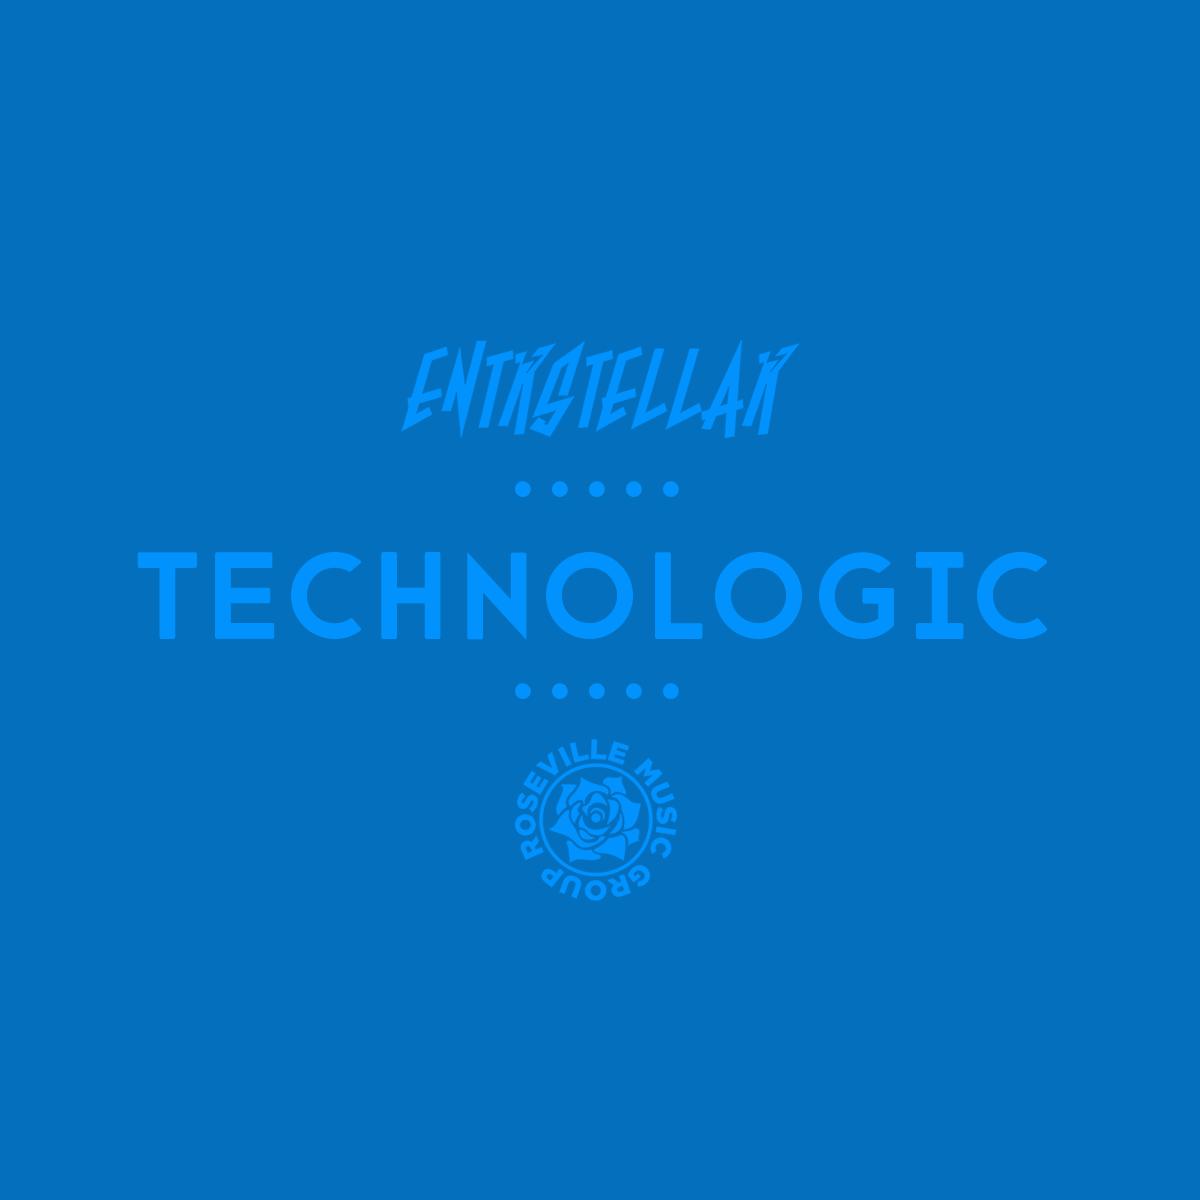 ENTRSTELLAR - Technologic [RMG EXCLUSIVE]